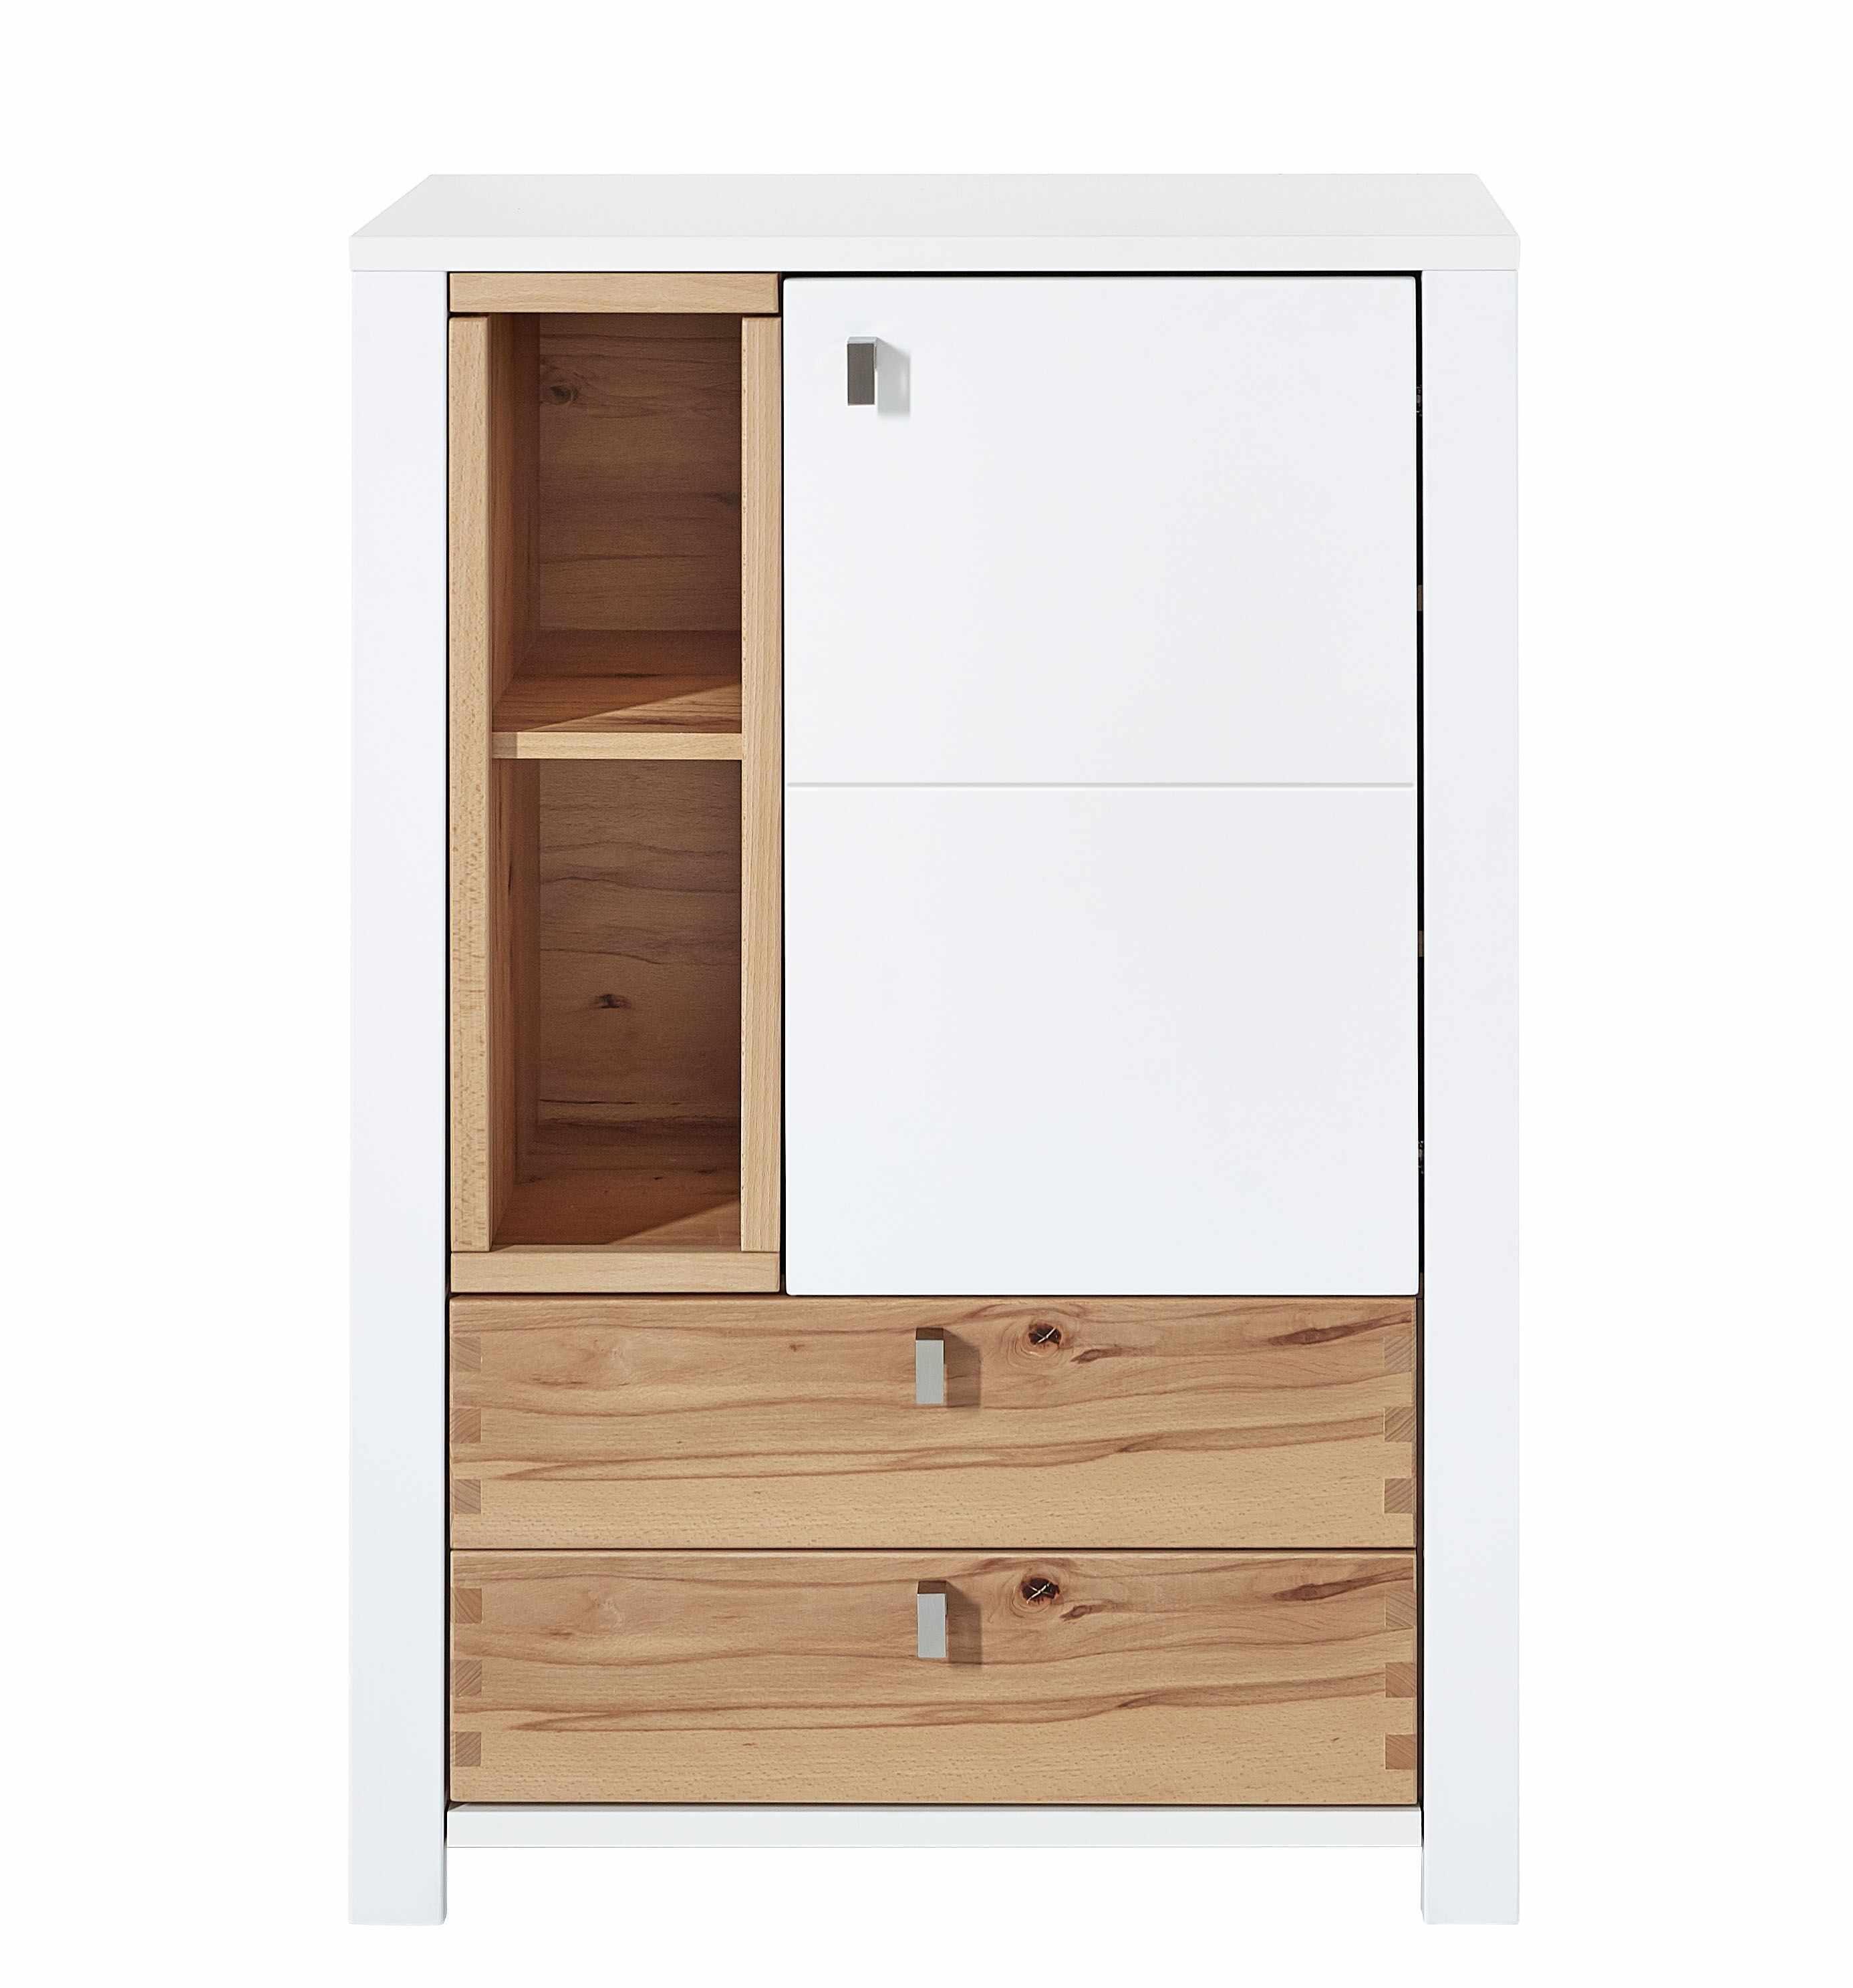 Cabinet din pal si MDF cu 2 sertare si 1 usa, Selina Alb / Natur, l73xA41xH106 cm la pret 1849 lei